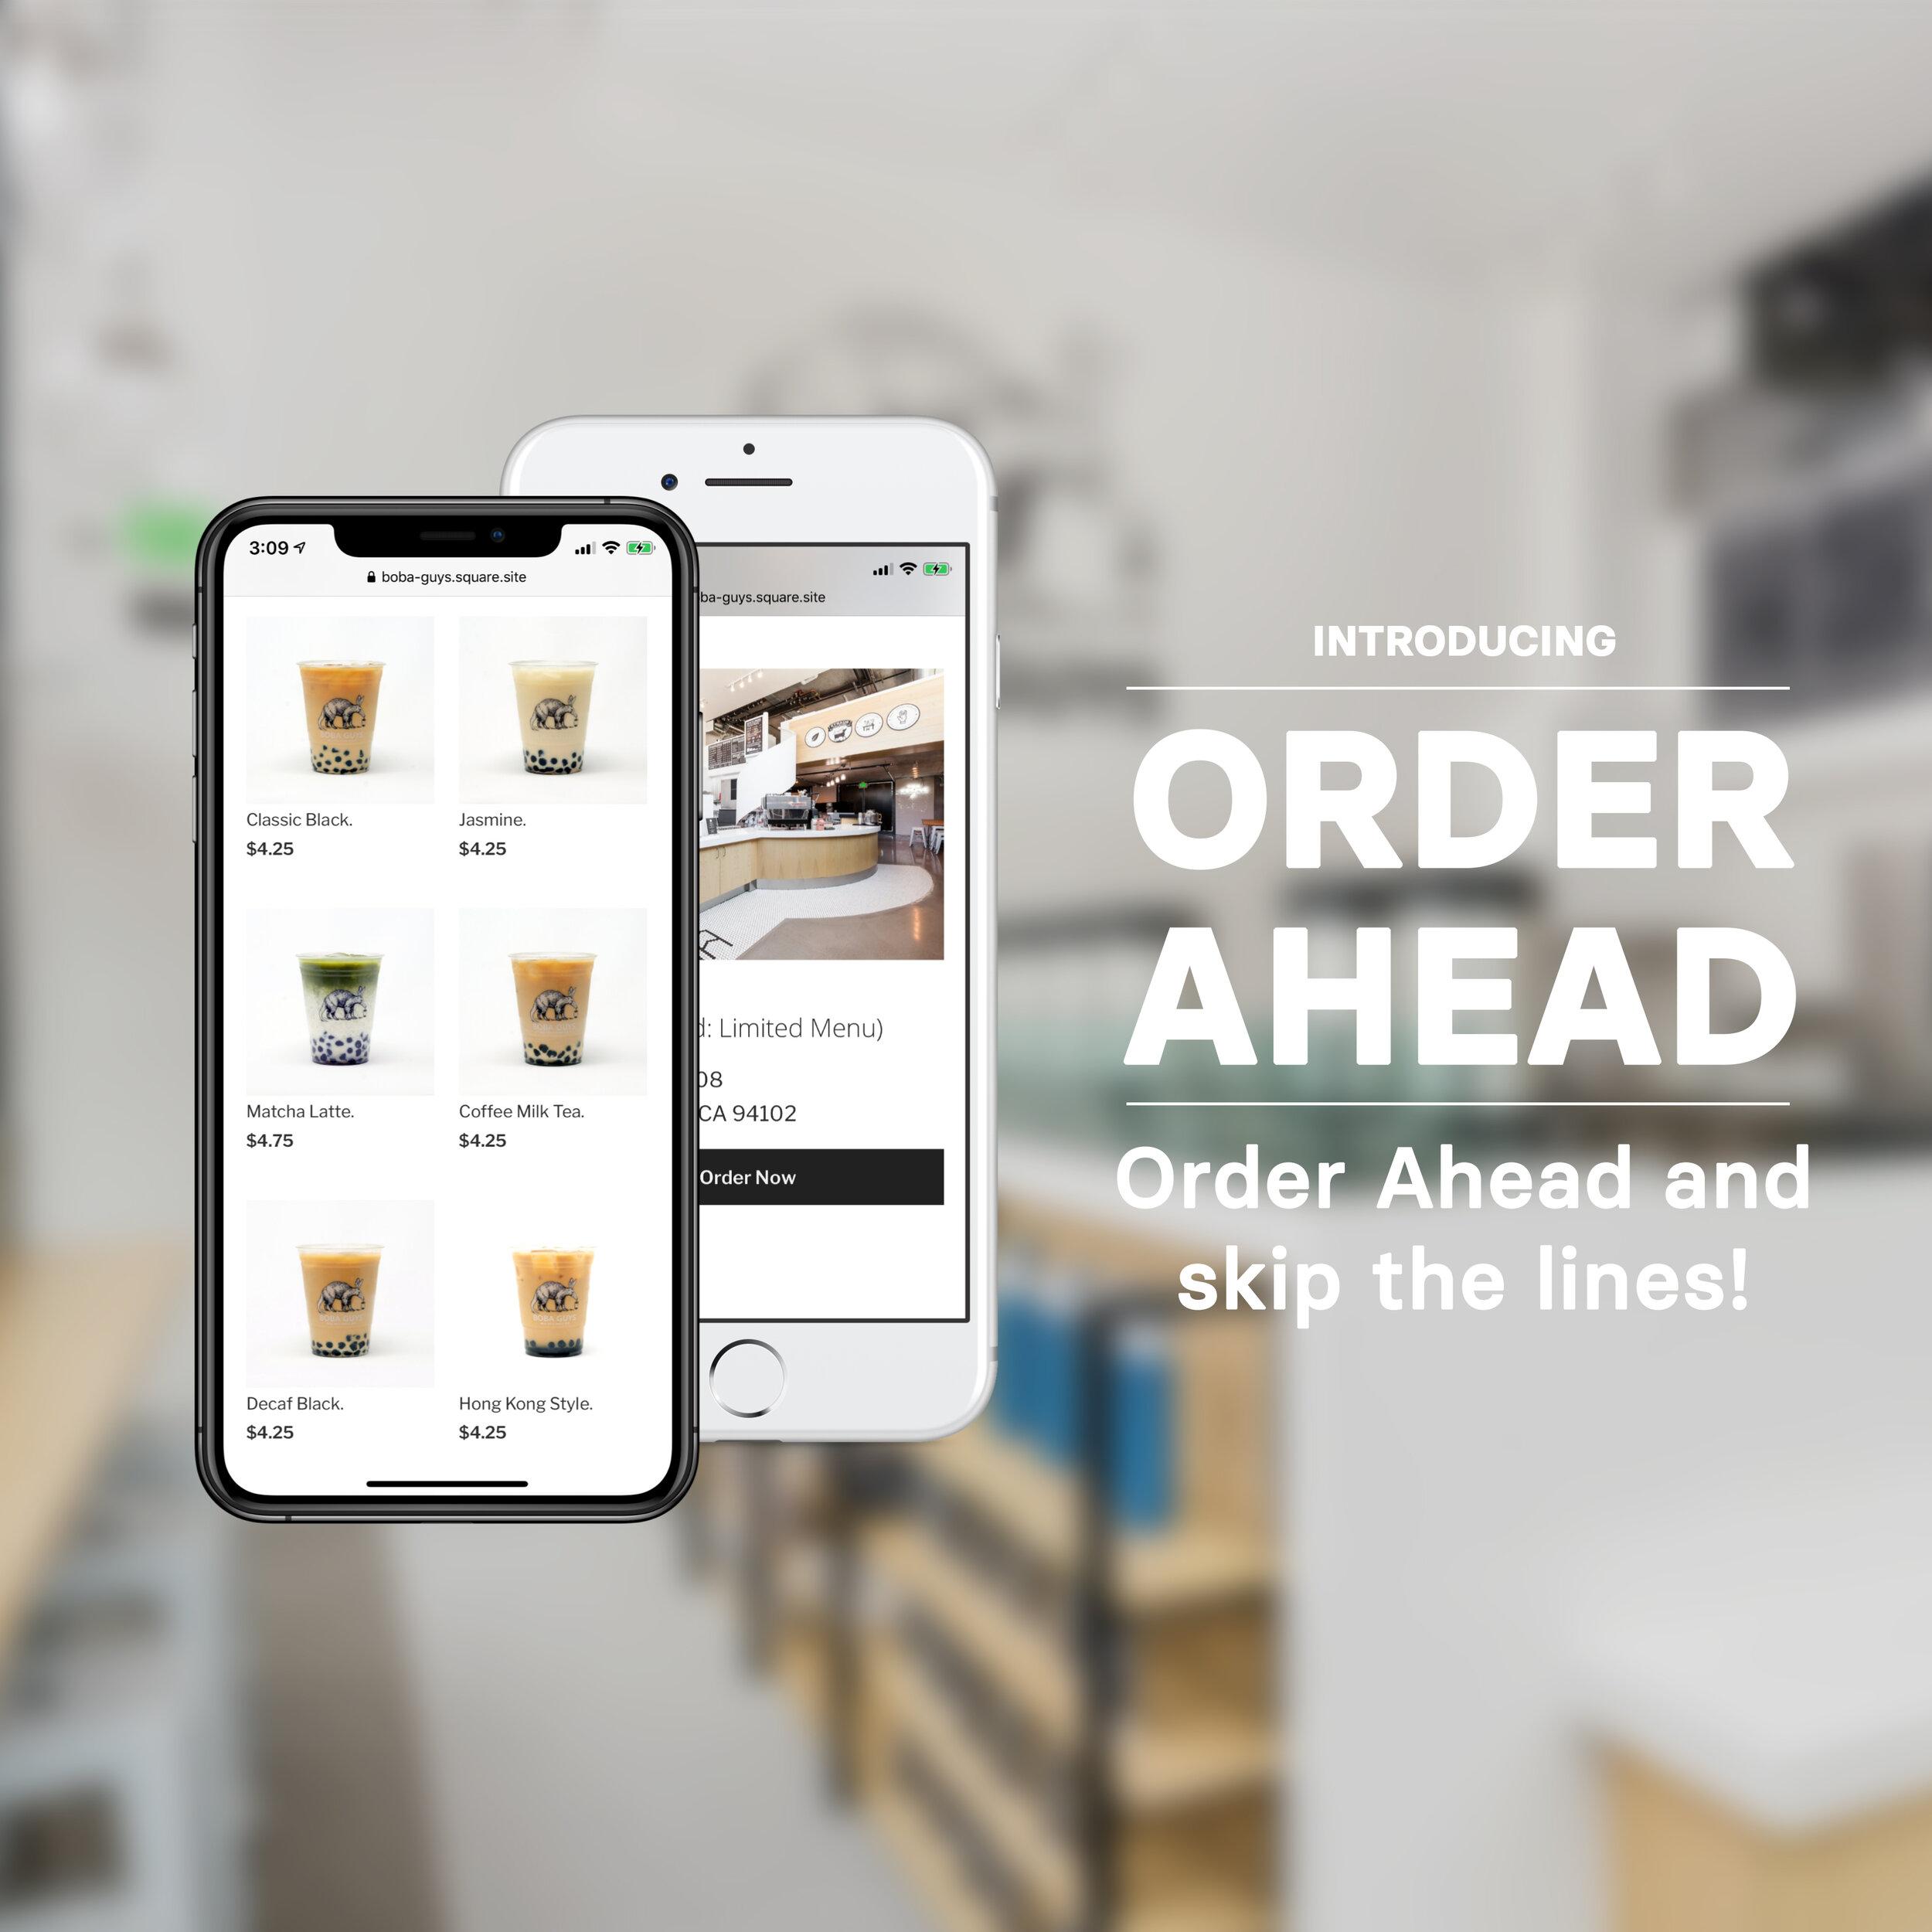 orderahead_websitepromo.jpg